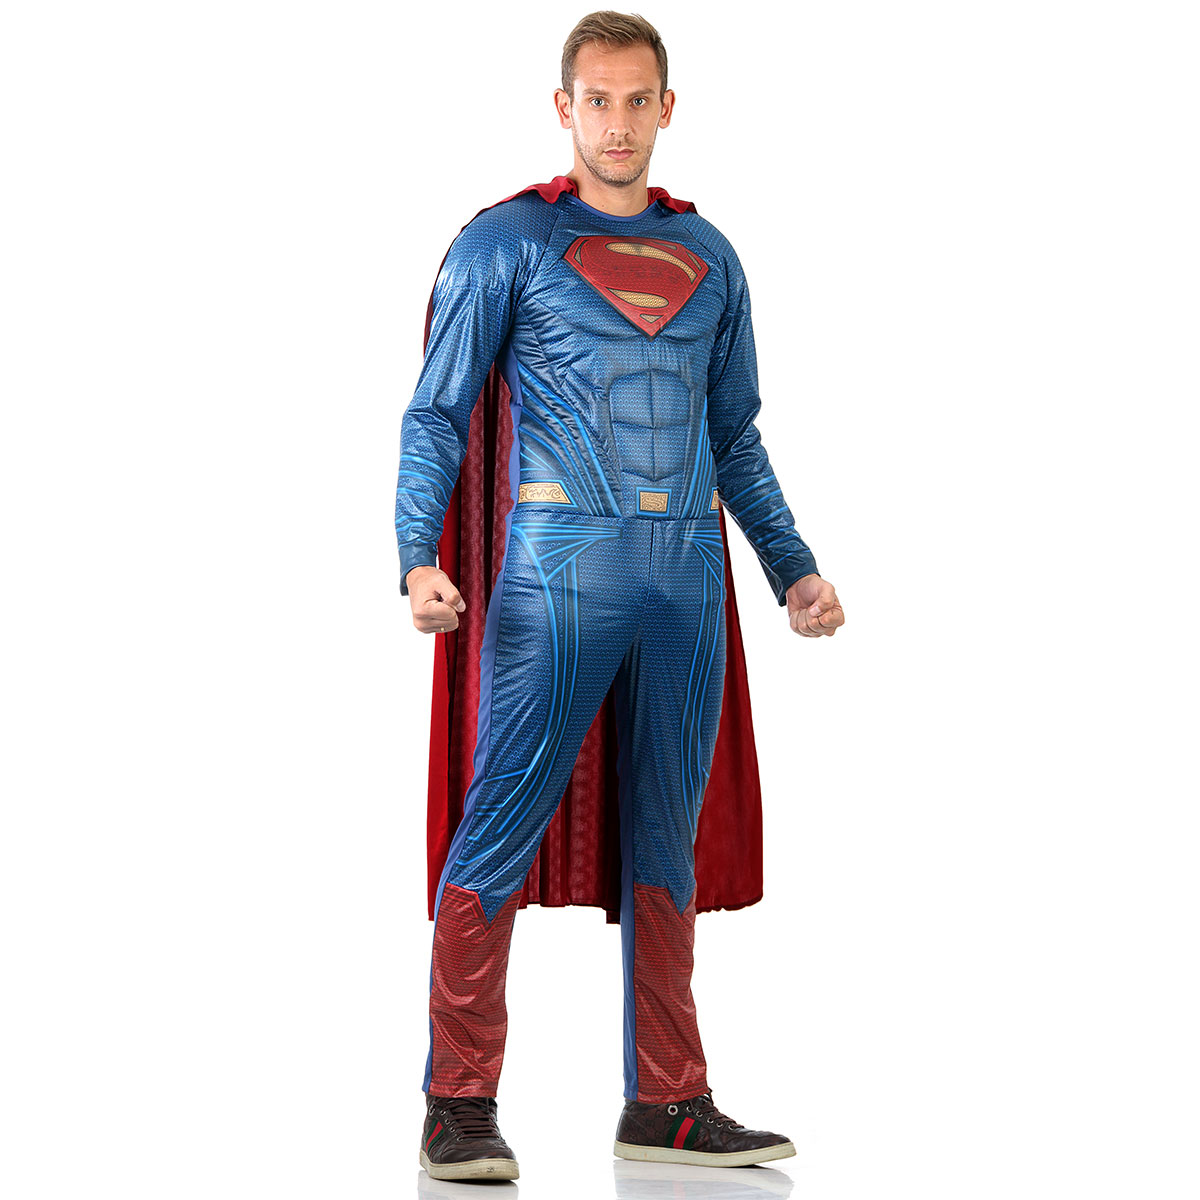 Fantasia Super Homem Adulto Filme Tam Grande